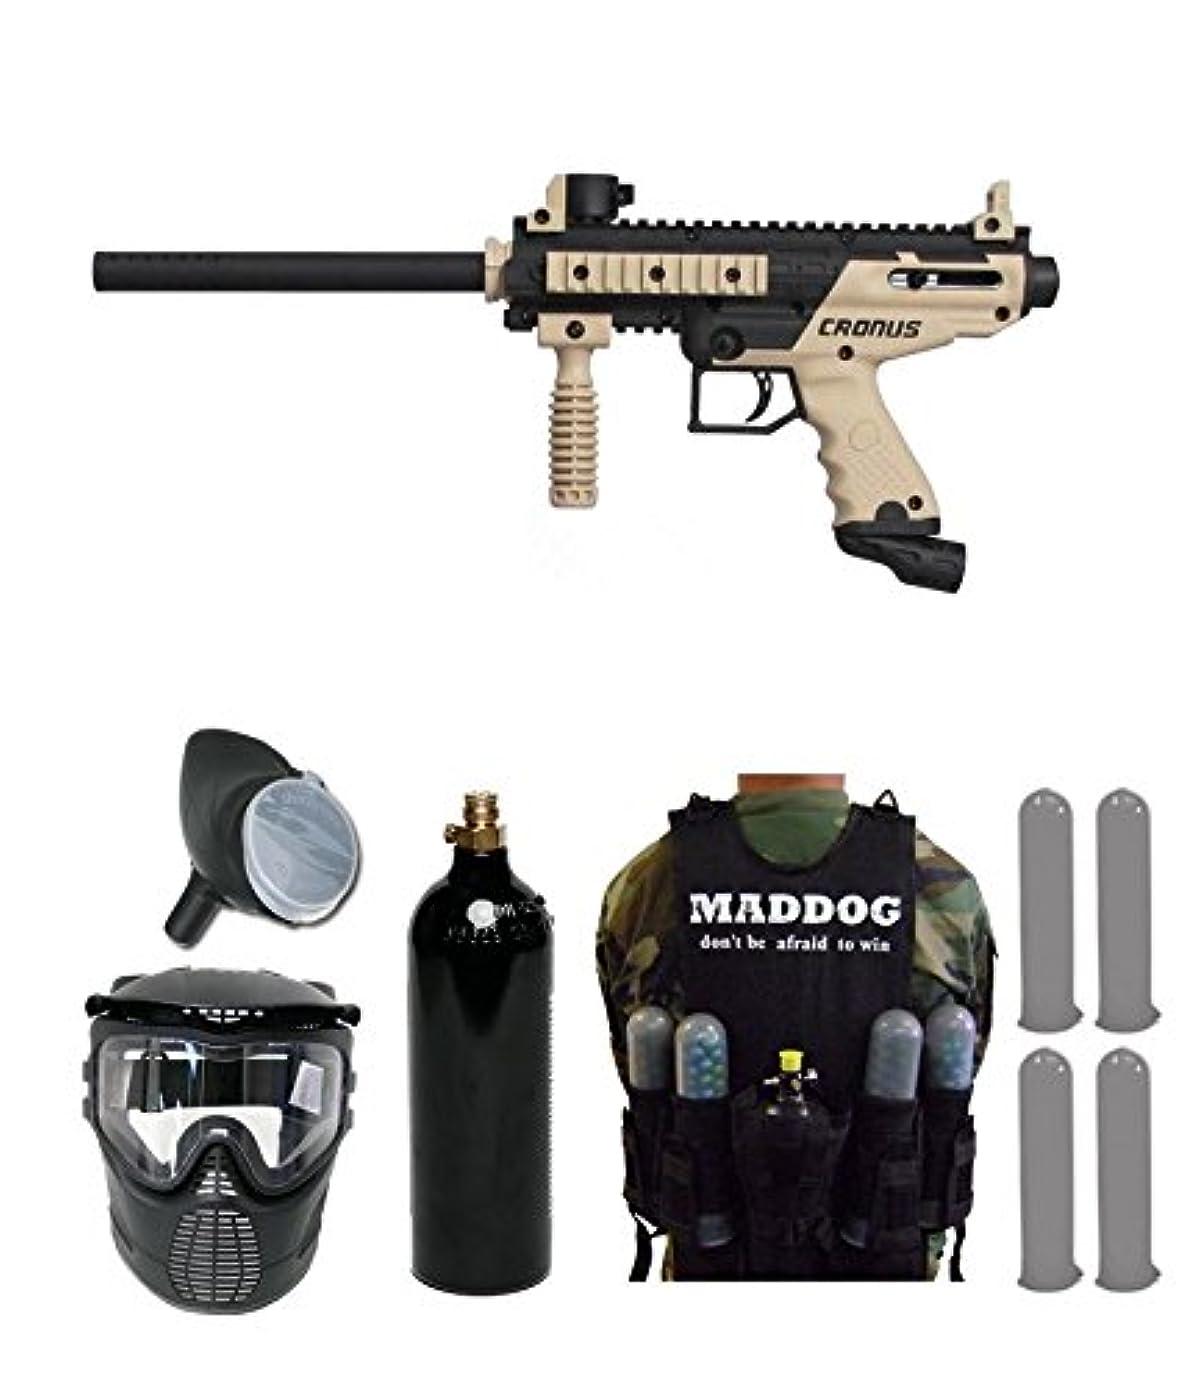 Tippmann Cronus Paintball Marker Gun -Basic Edition- Tan SWAT Package